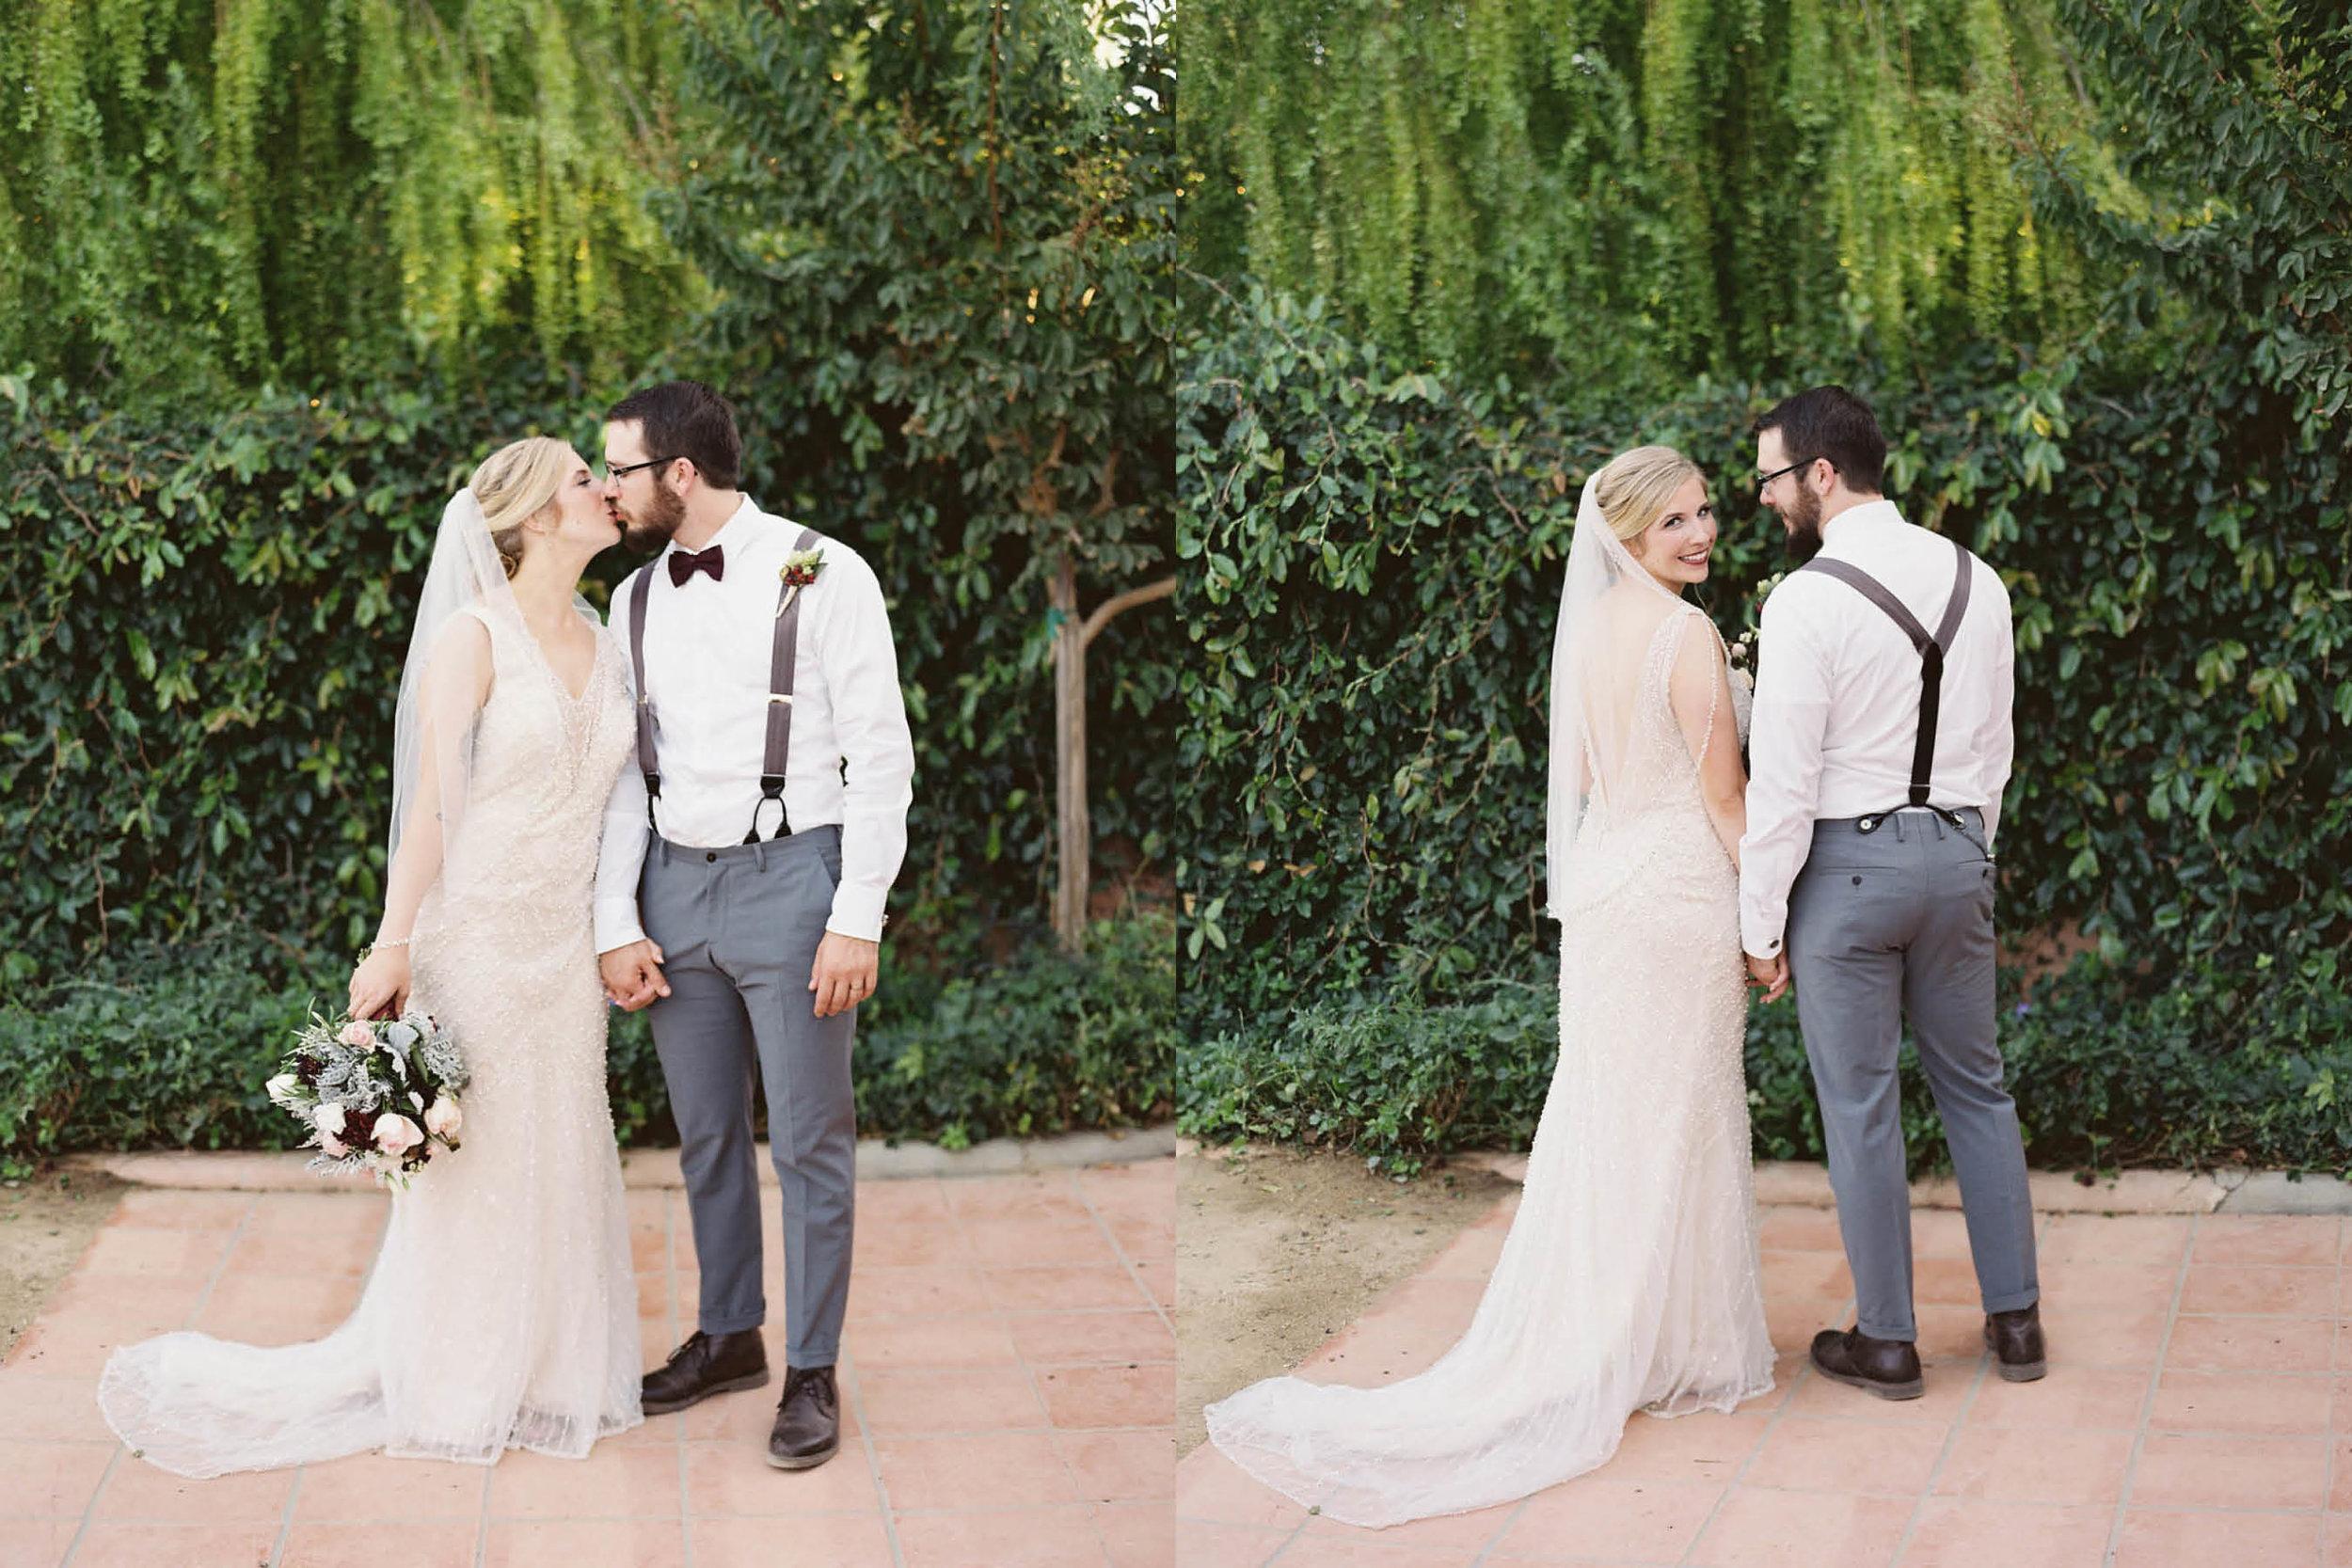 santa-barbara-elopement-wedding-planning-planner-coordinator-day-of-rustic-barn-apple-creek-ranch (6).jpg